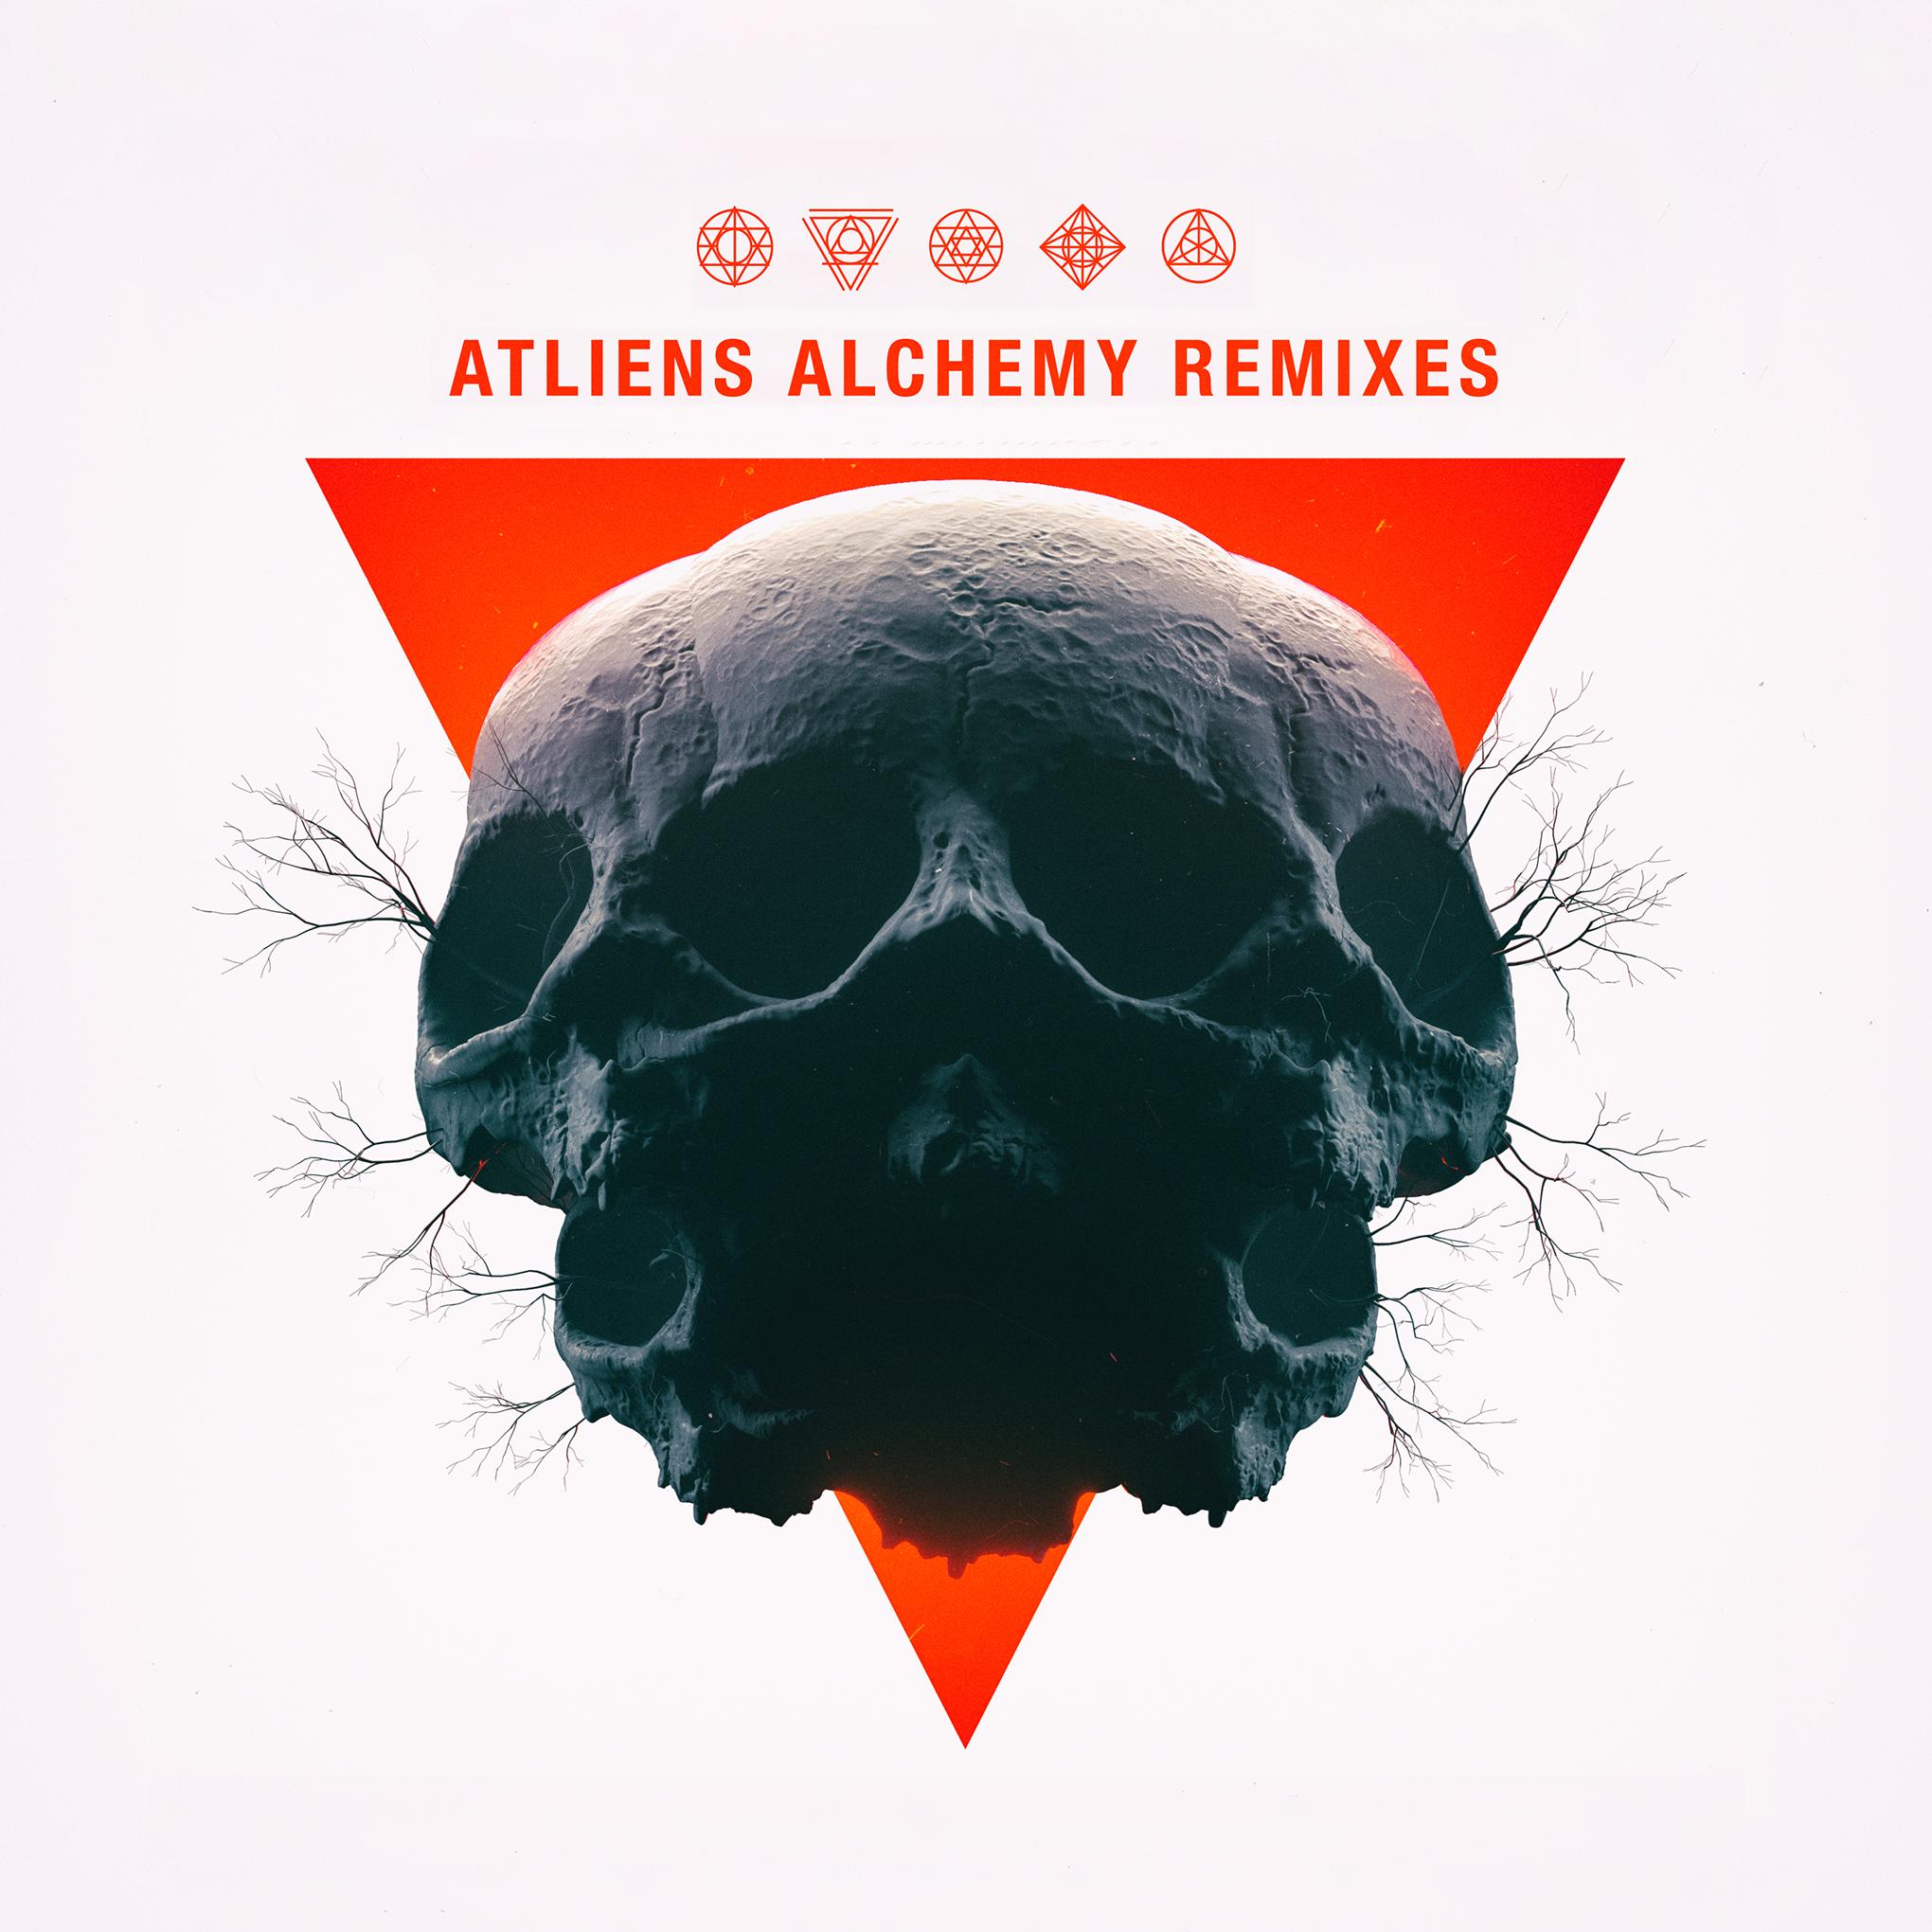 ATliens Alchemy Remix Cover Art5.png